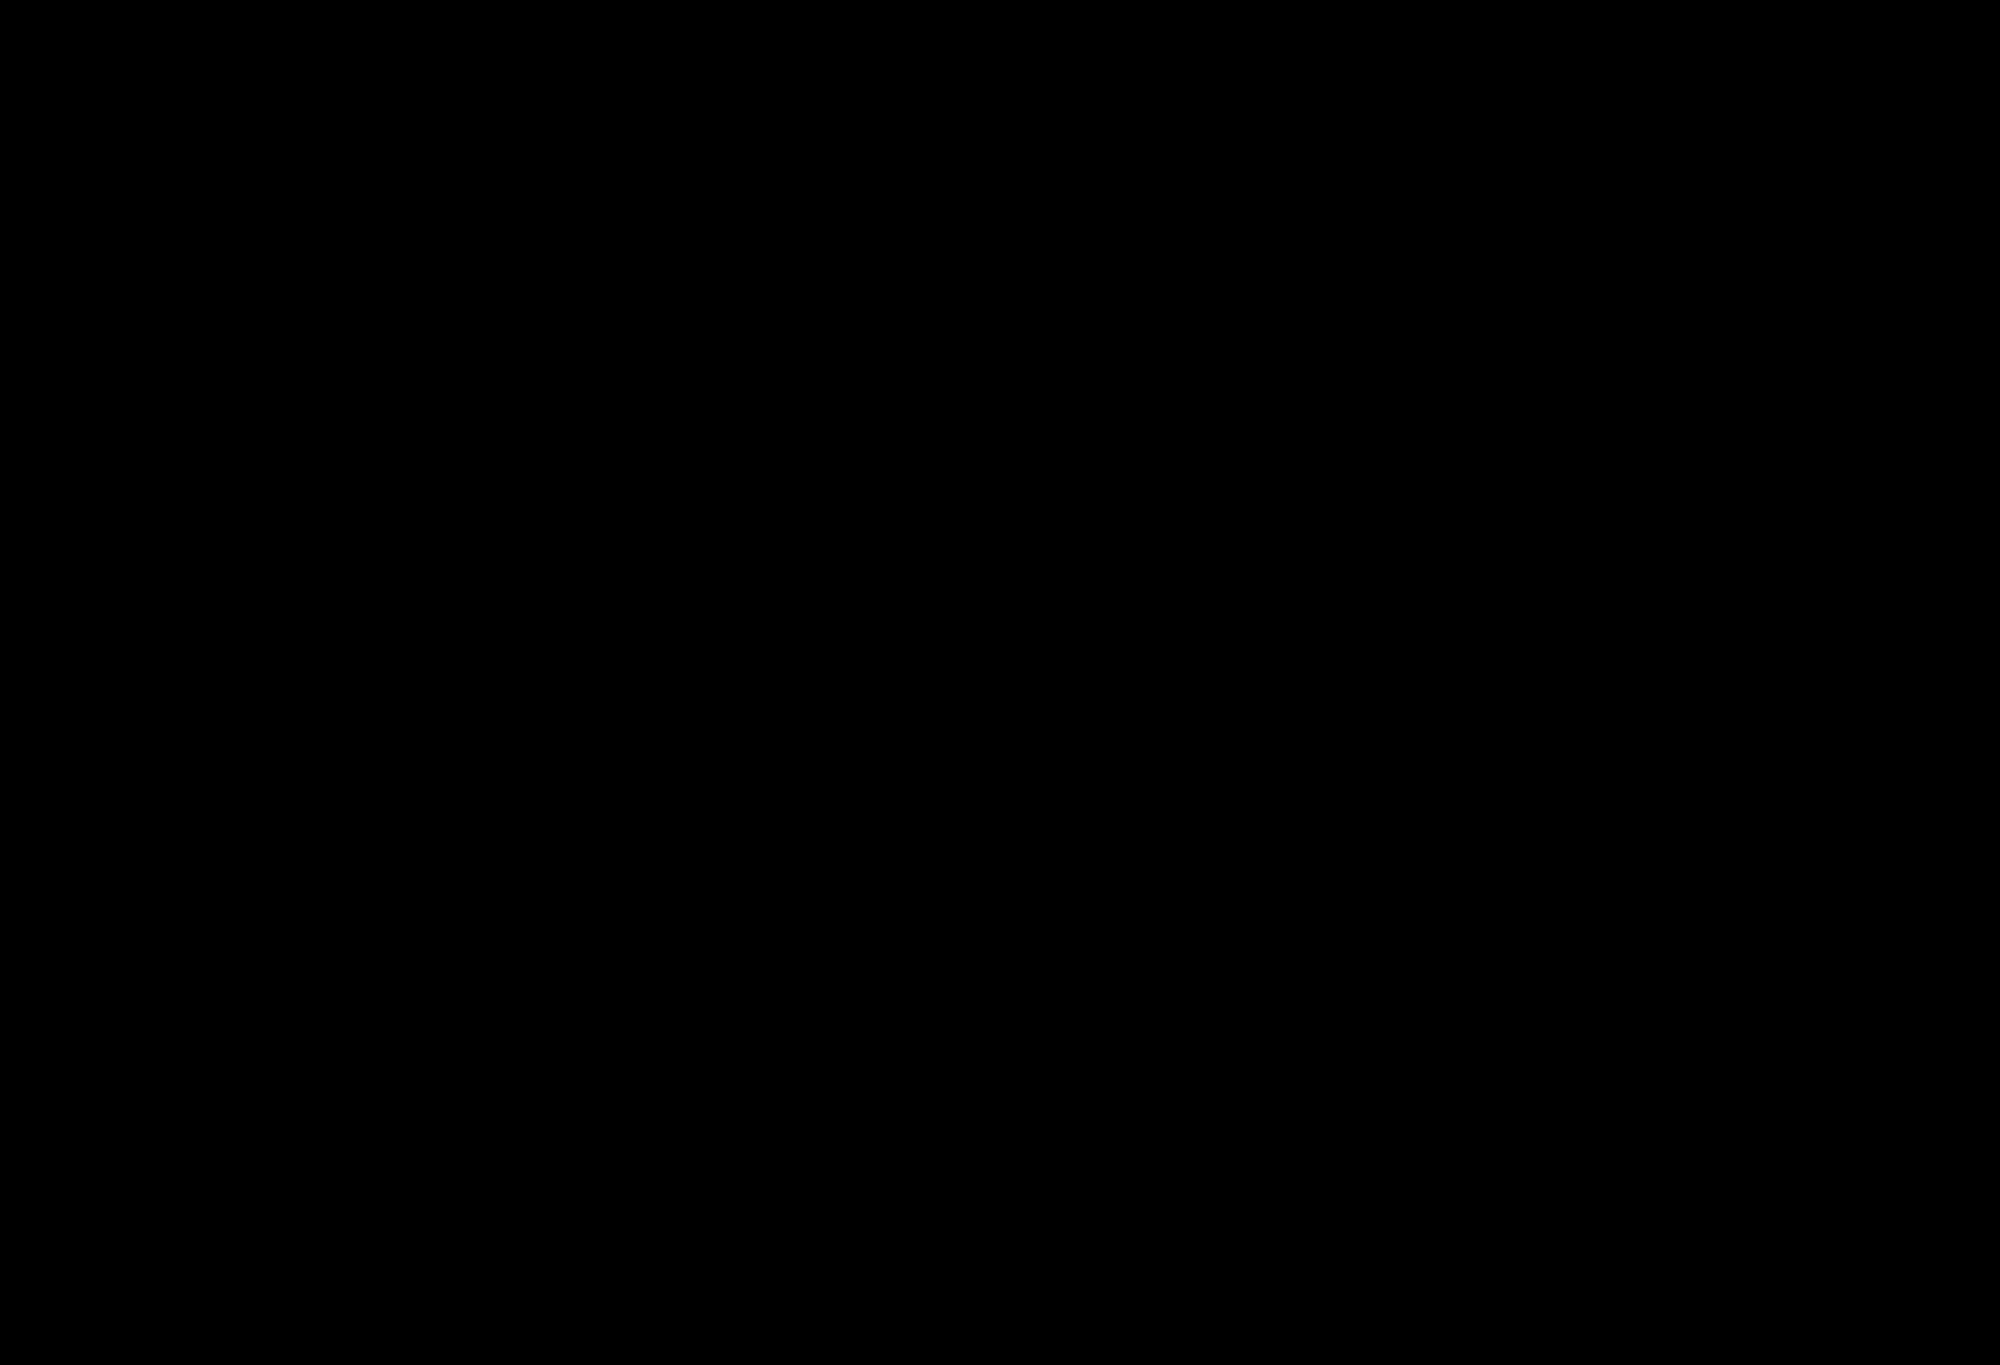 open chair-logo-black.png